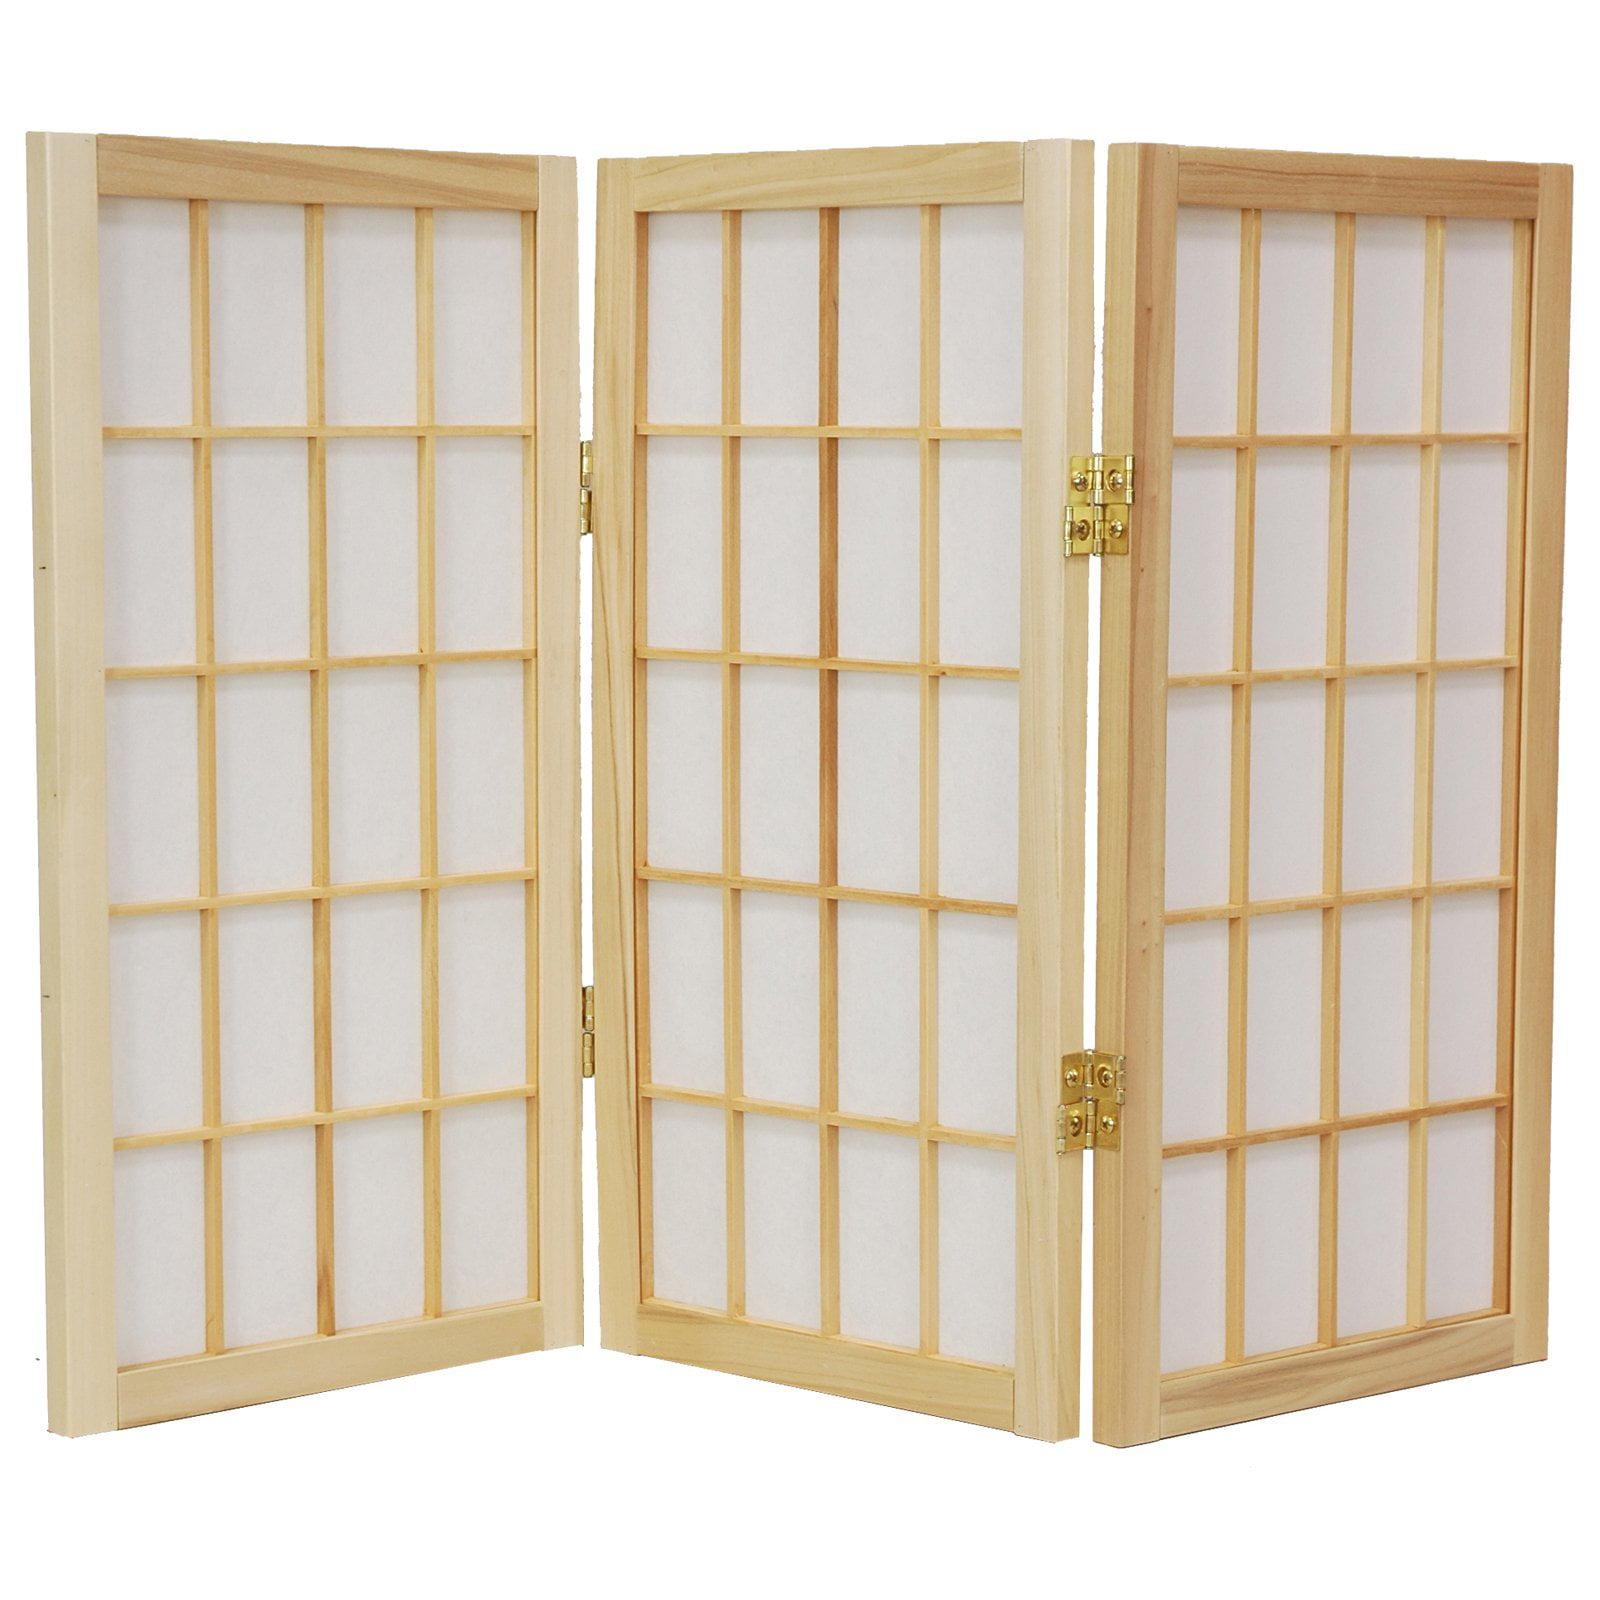 Japanese Shoji Panels Are Like Shoji Screens And Can Be Used On ...